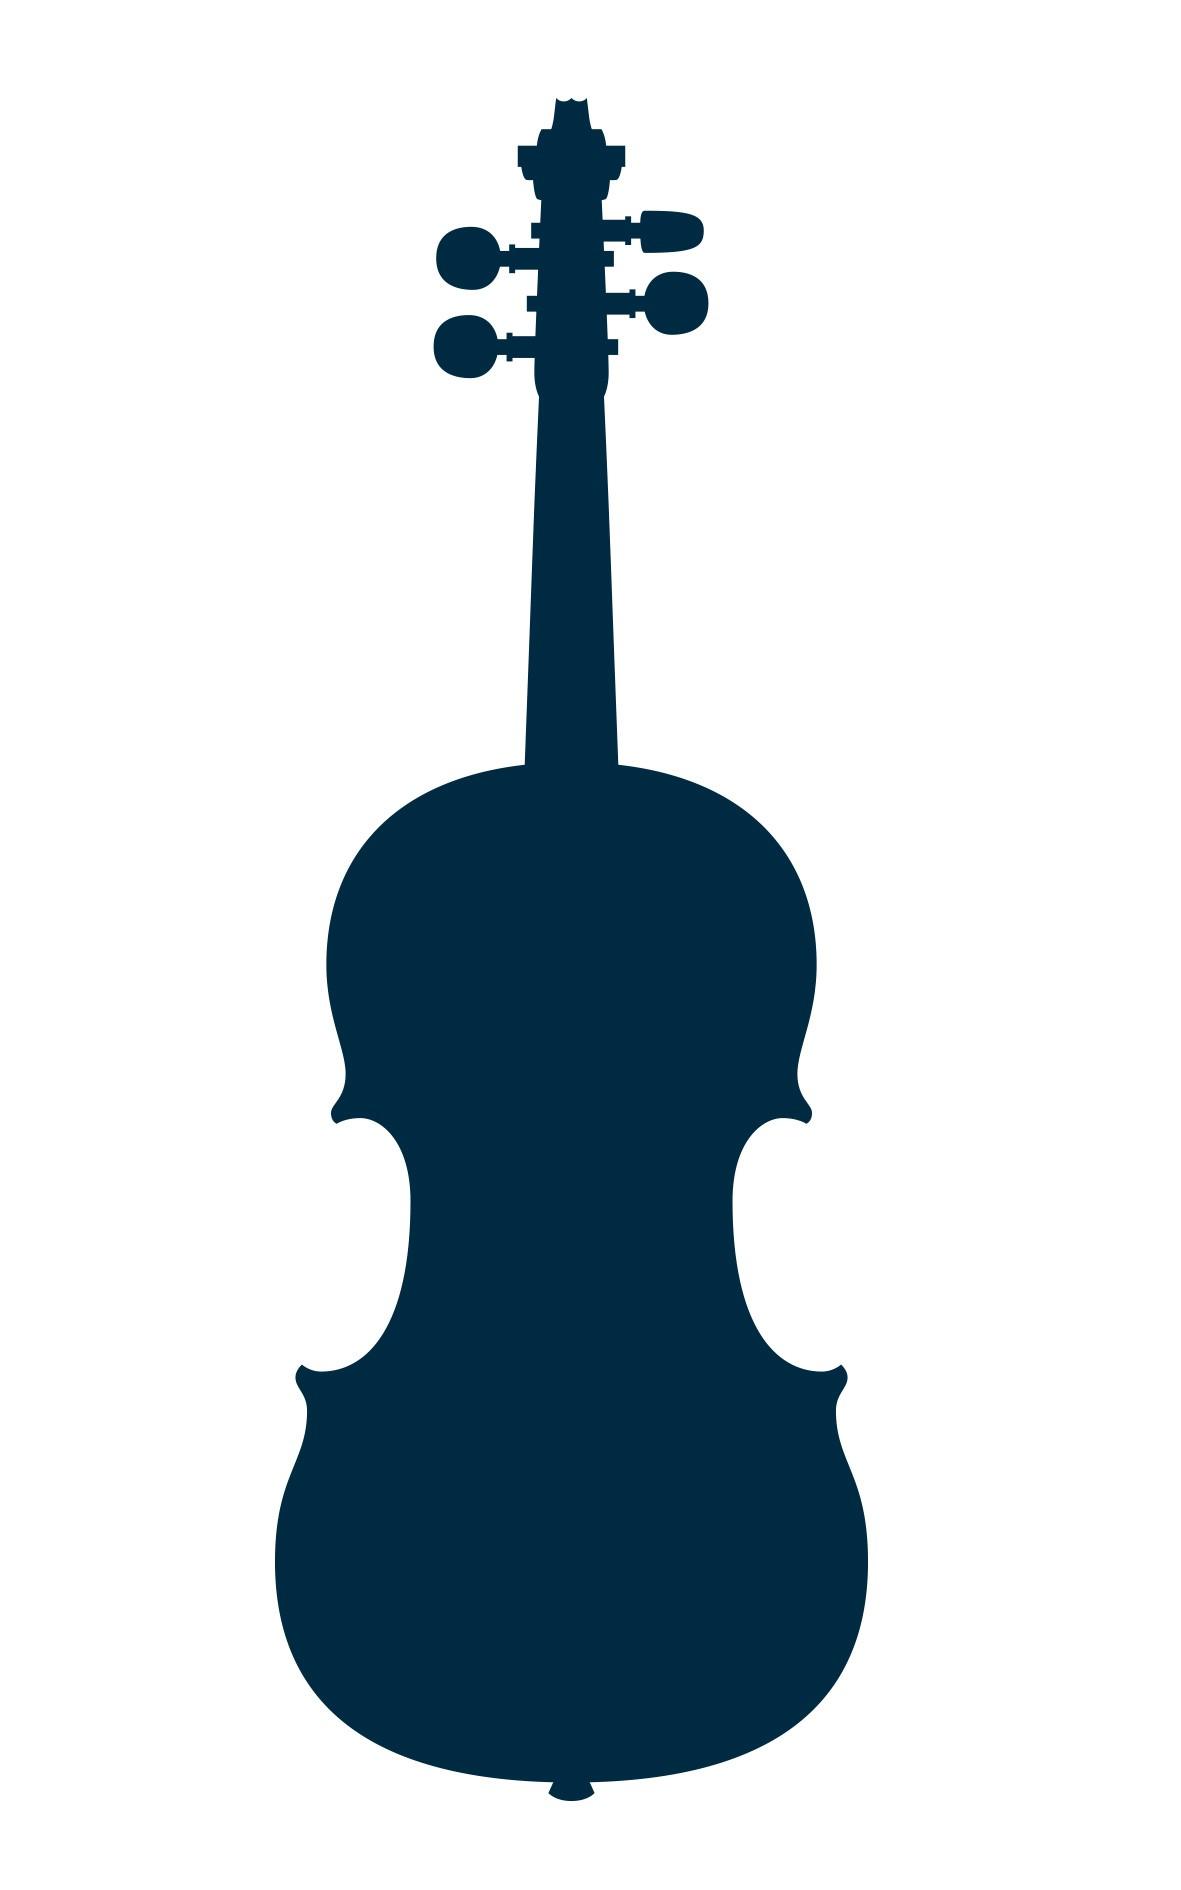 Fine violin by Richard Haller